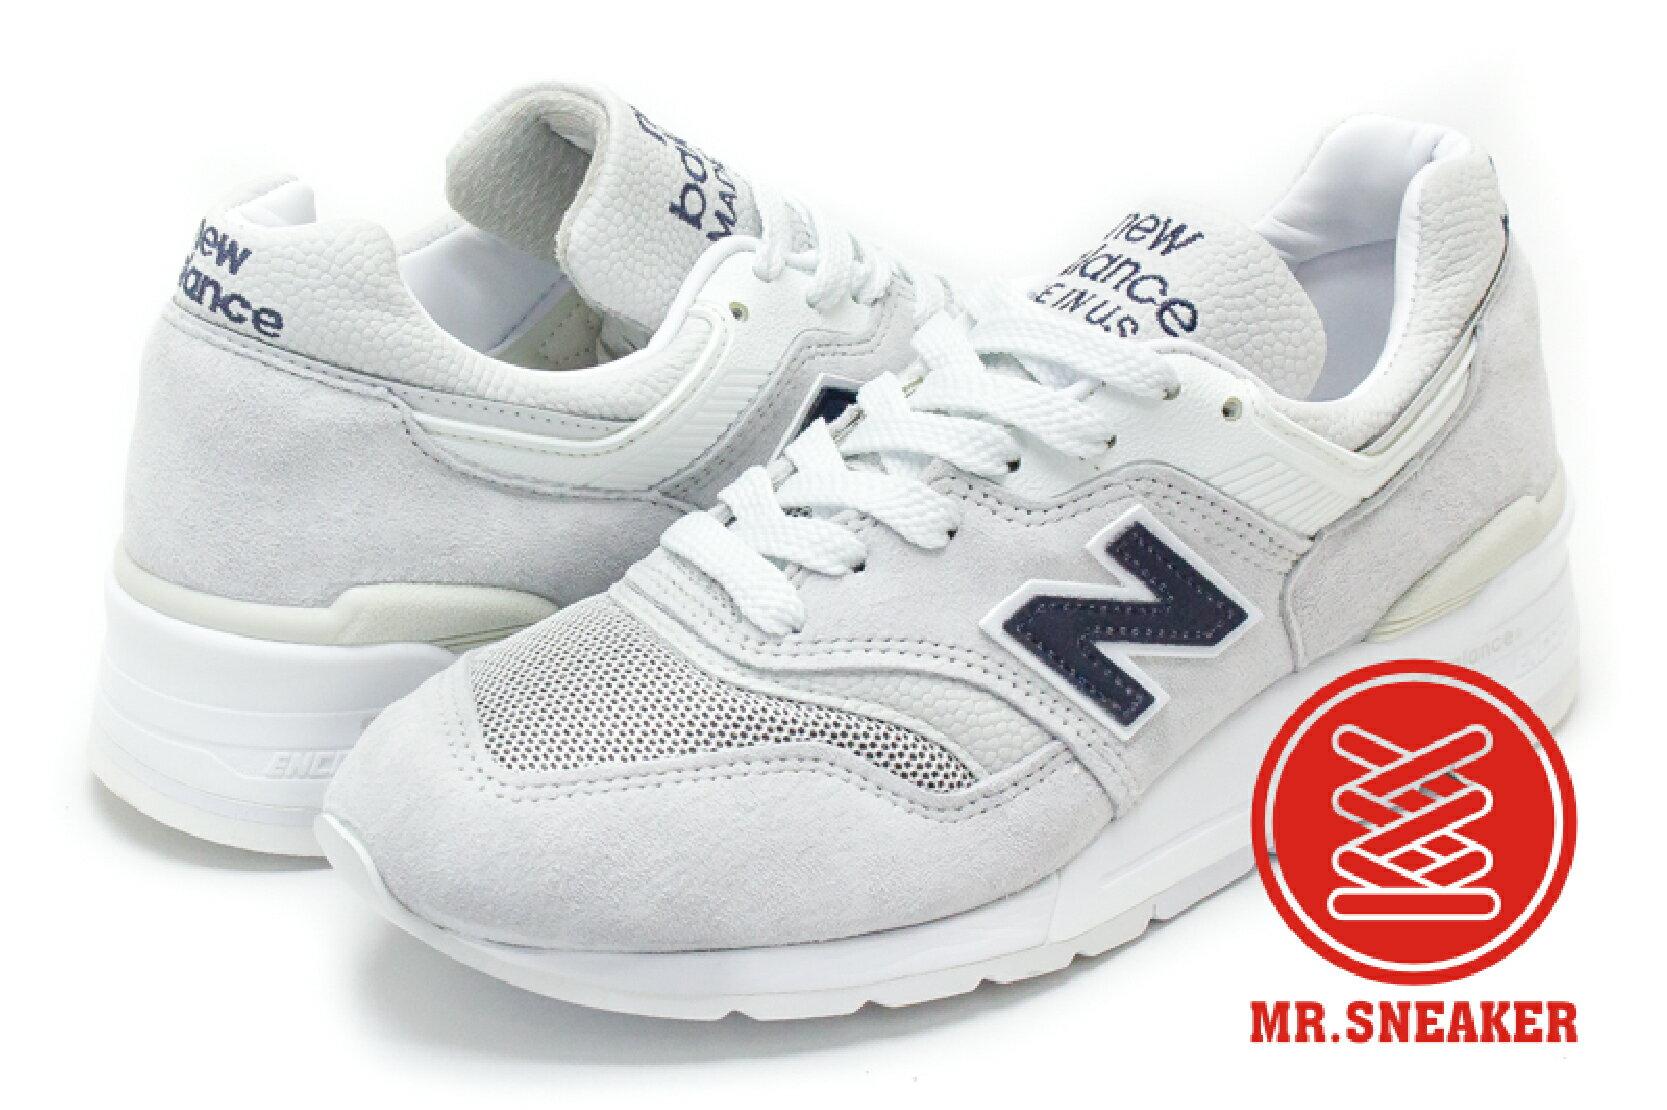 ☆Mr.Sneaker☆NEW BALANCE 997 美製 USA 皮革 白色 男女段 M997JOL